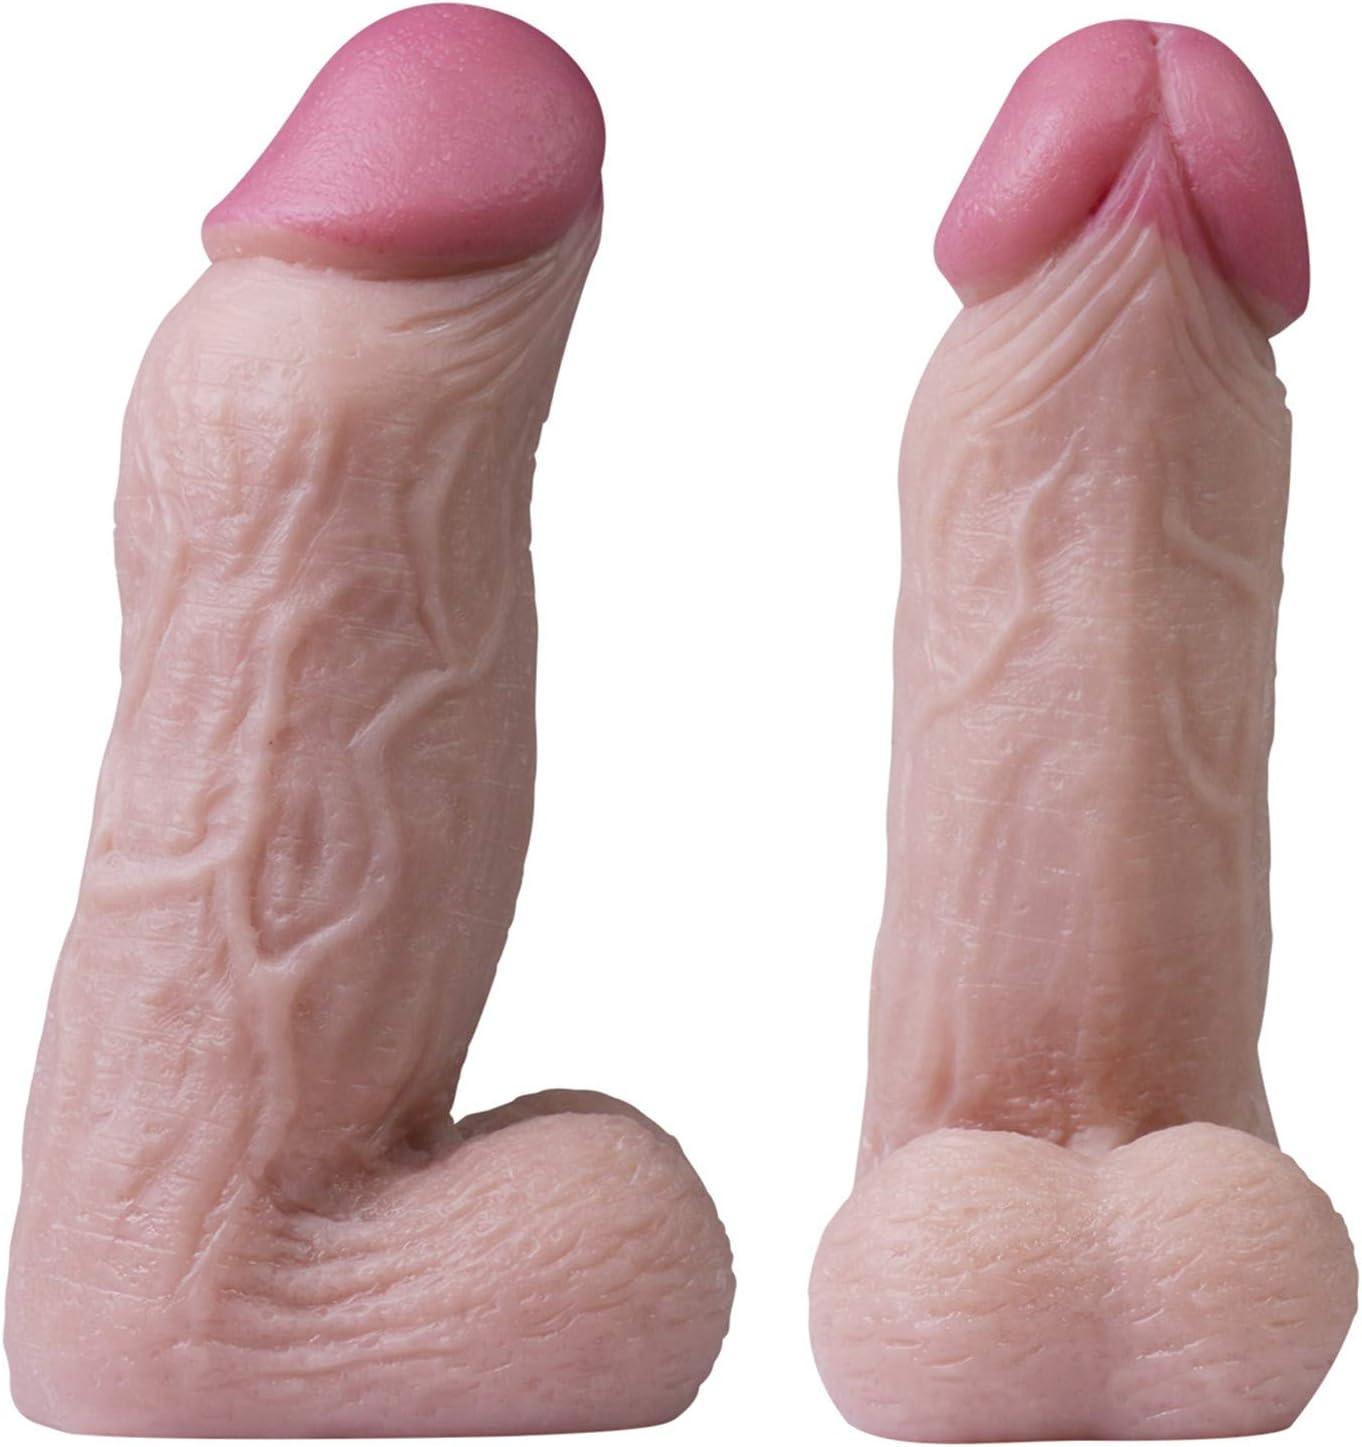 Webcam Huge Dildo Anal Squirt